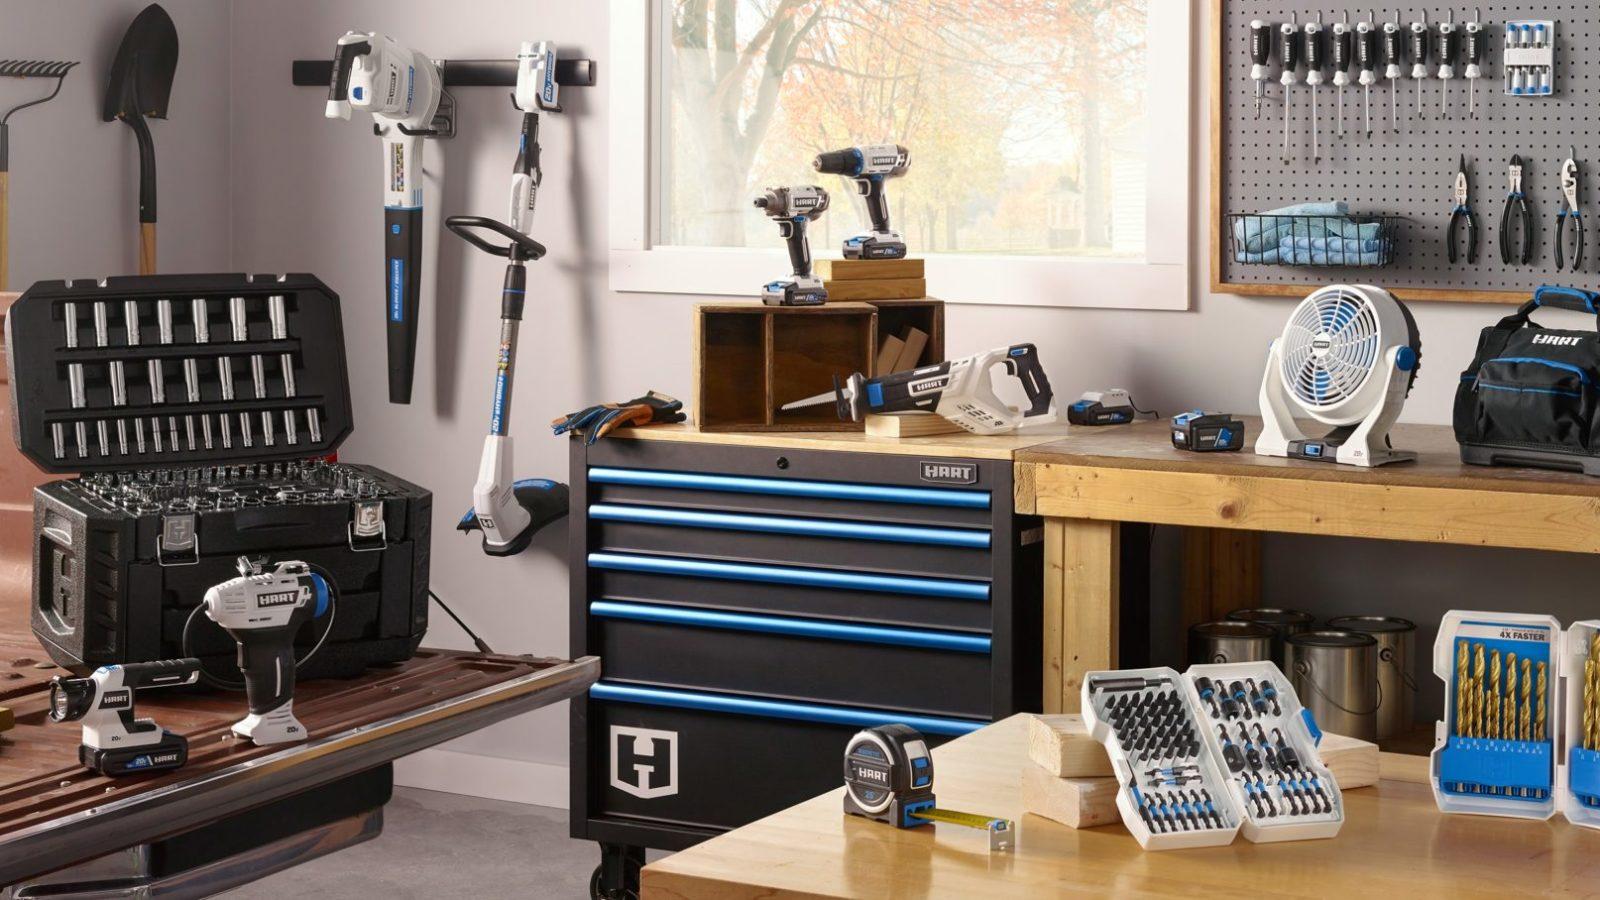 HART Tools in workshop